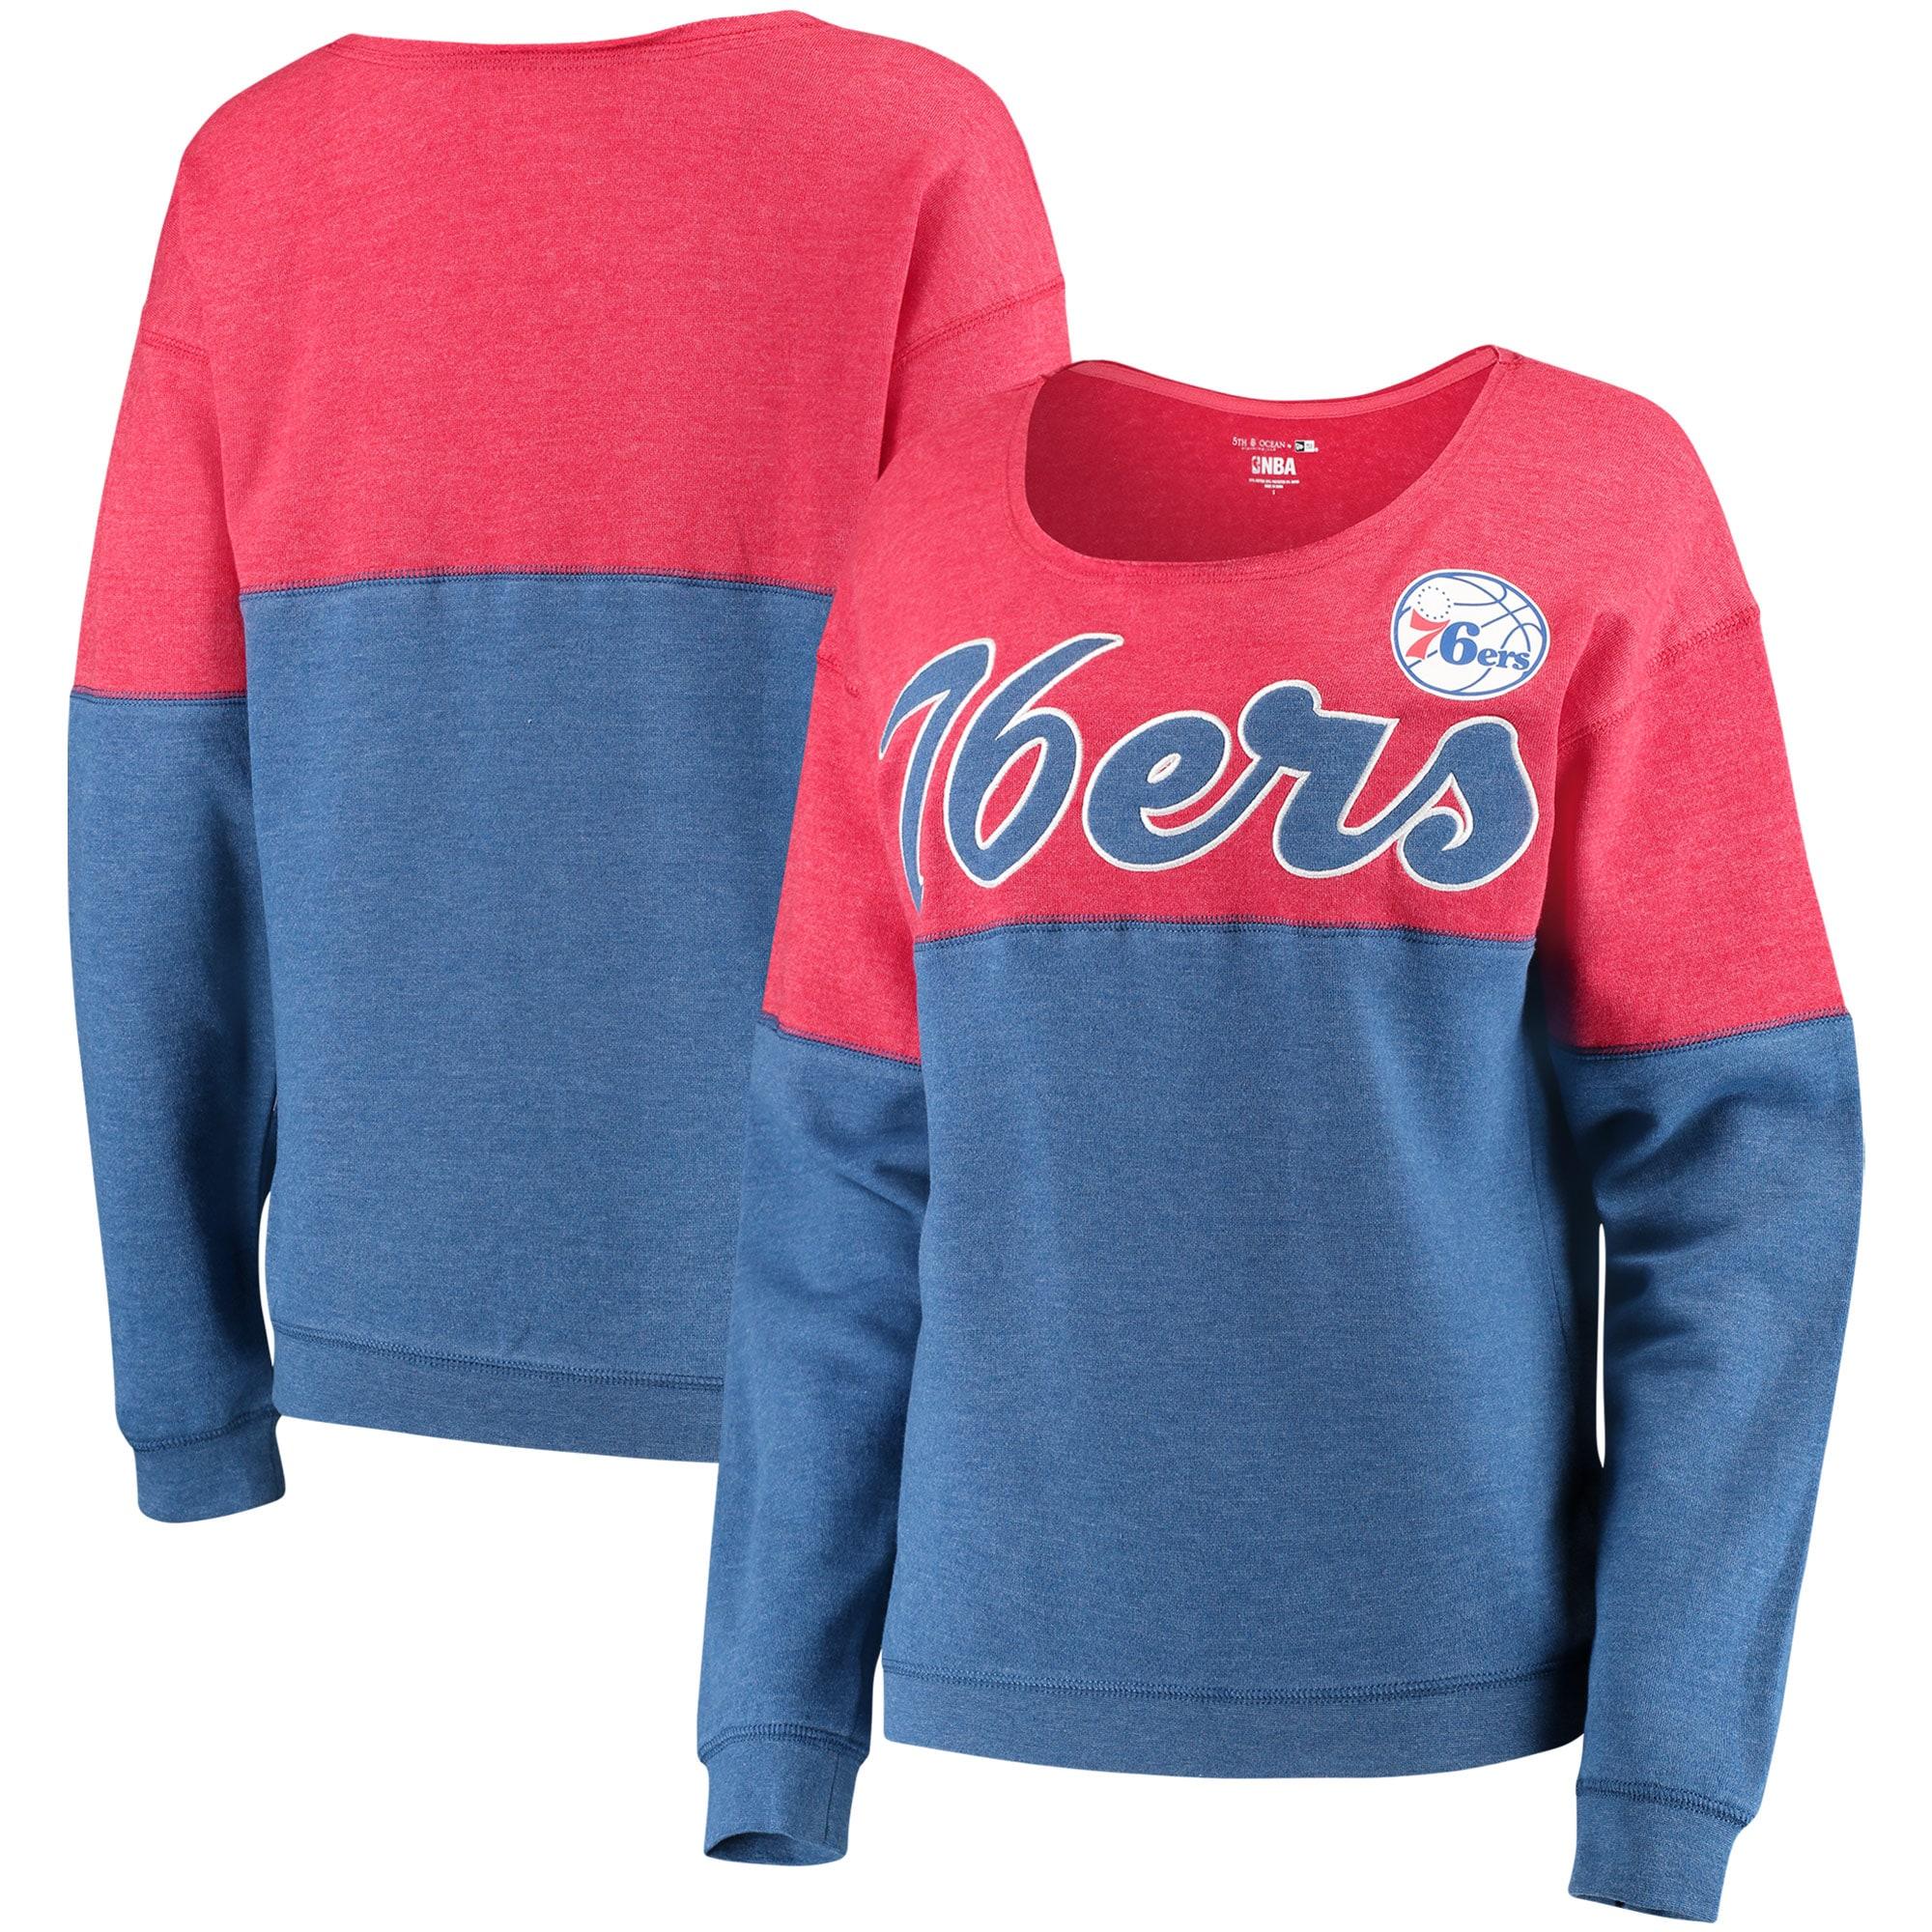 Philadelphia 76ers New Era Women's Fleece Tri-Blend Scoop Neck Pullover Sweatshirt - Heathered Royal/Heathered Red